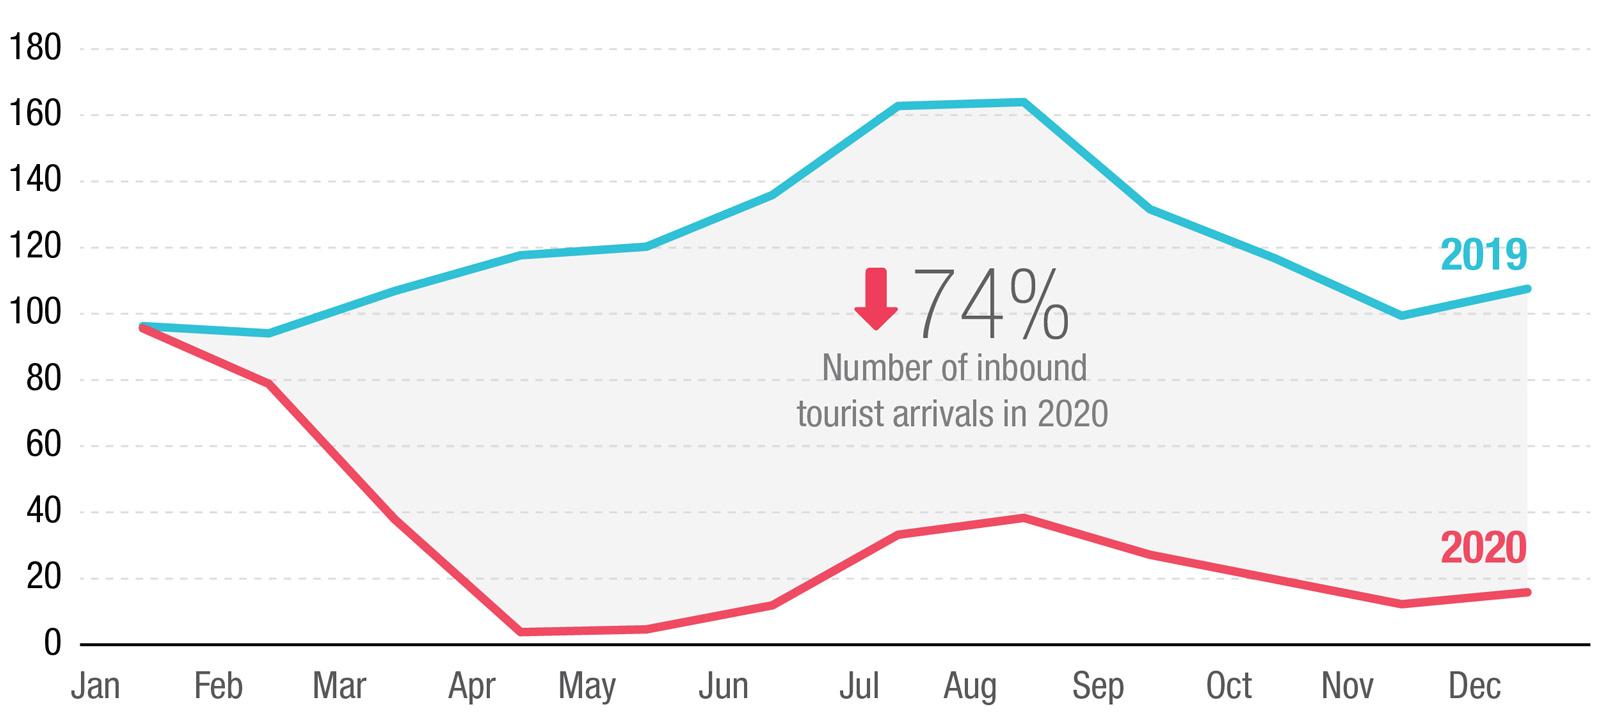 International tourist arrivals 2019 and 2020